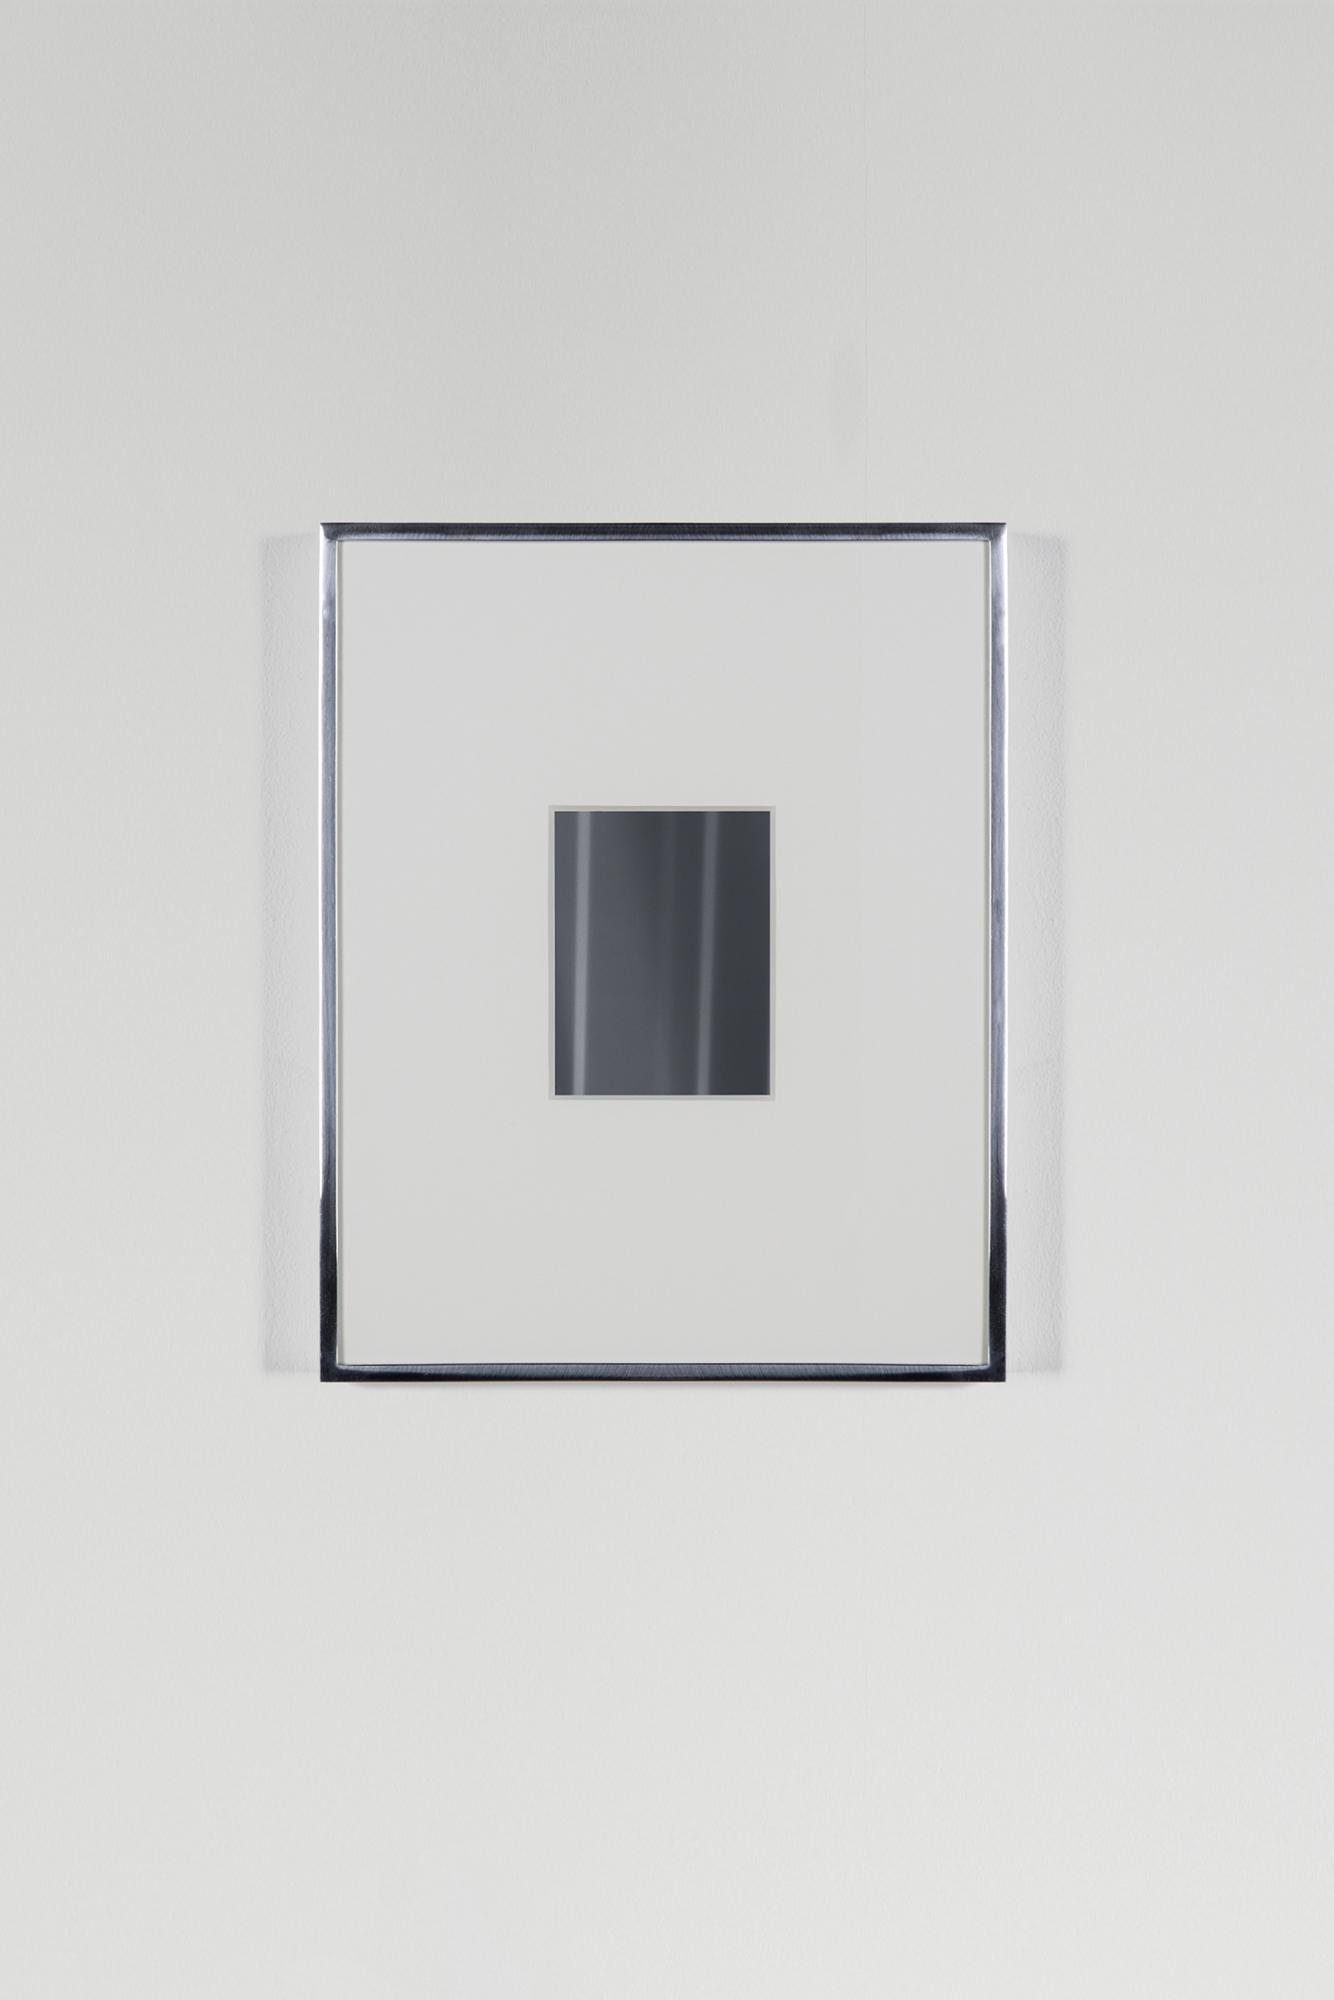 Transparency (Negative) [Kodak Portra 400NC Em. No. 1022: May 27–July 7, 2016 LAX/JFK EWR/FRA/GVA MRS/ATH/JMK JMK/FCO FCO/MRS MRS/LHR LHR/LAX]    2017   Epson Ultrachrome K3 archival ink jet print on Museo Silver Rag Paper  14 x 11 inches   Transparencies, 2014–